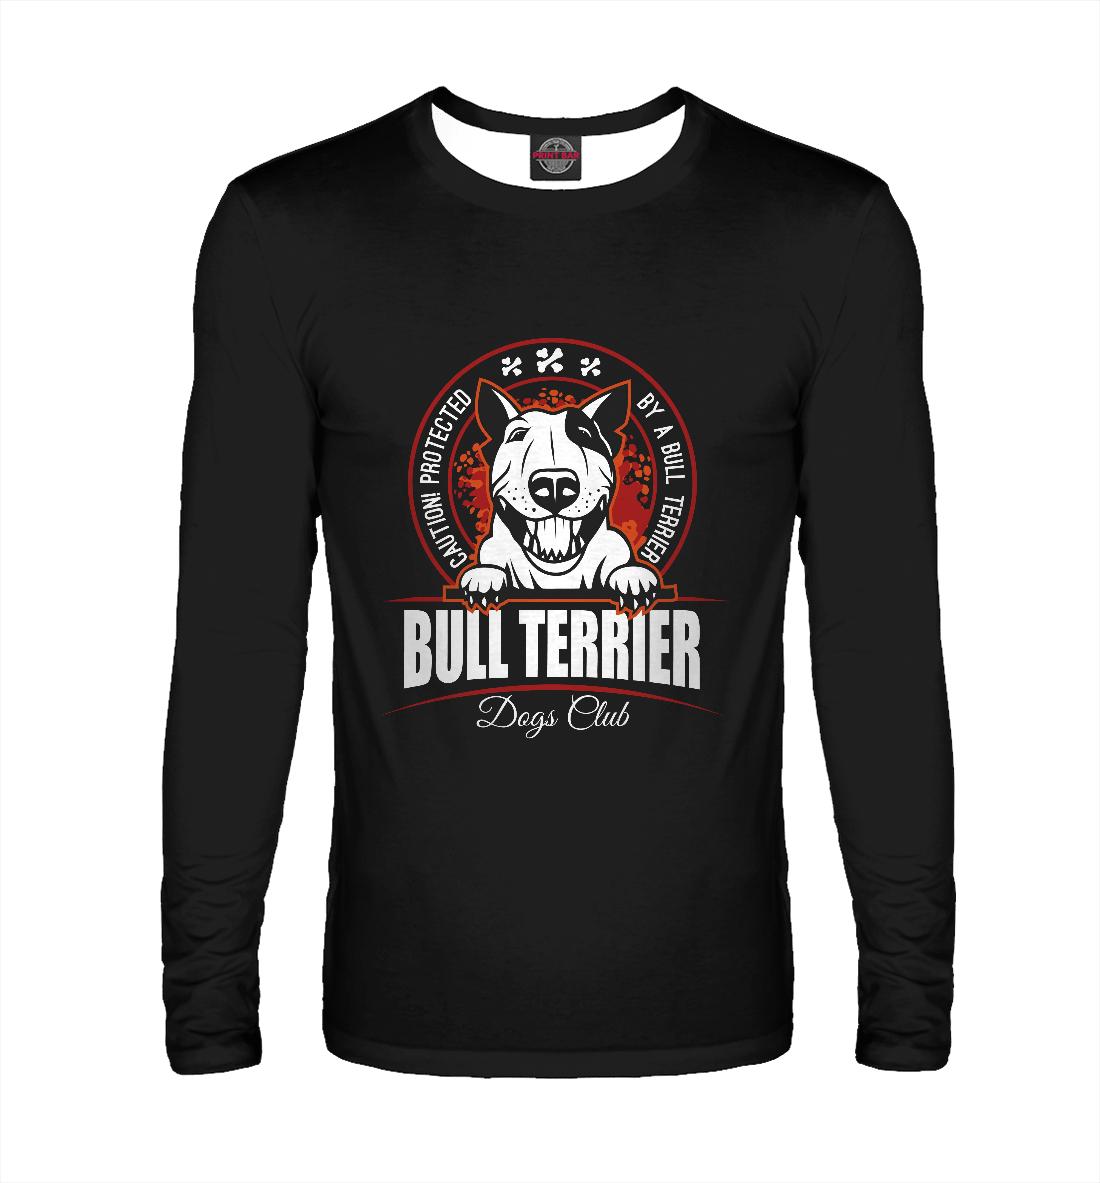 Фото - Bull terrier muriel p lee scottish terrier